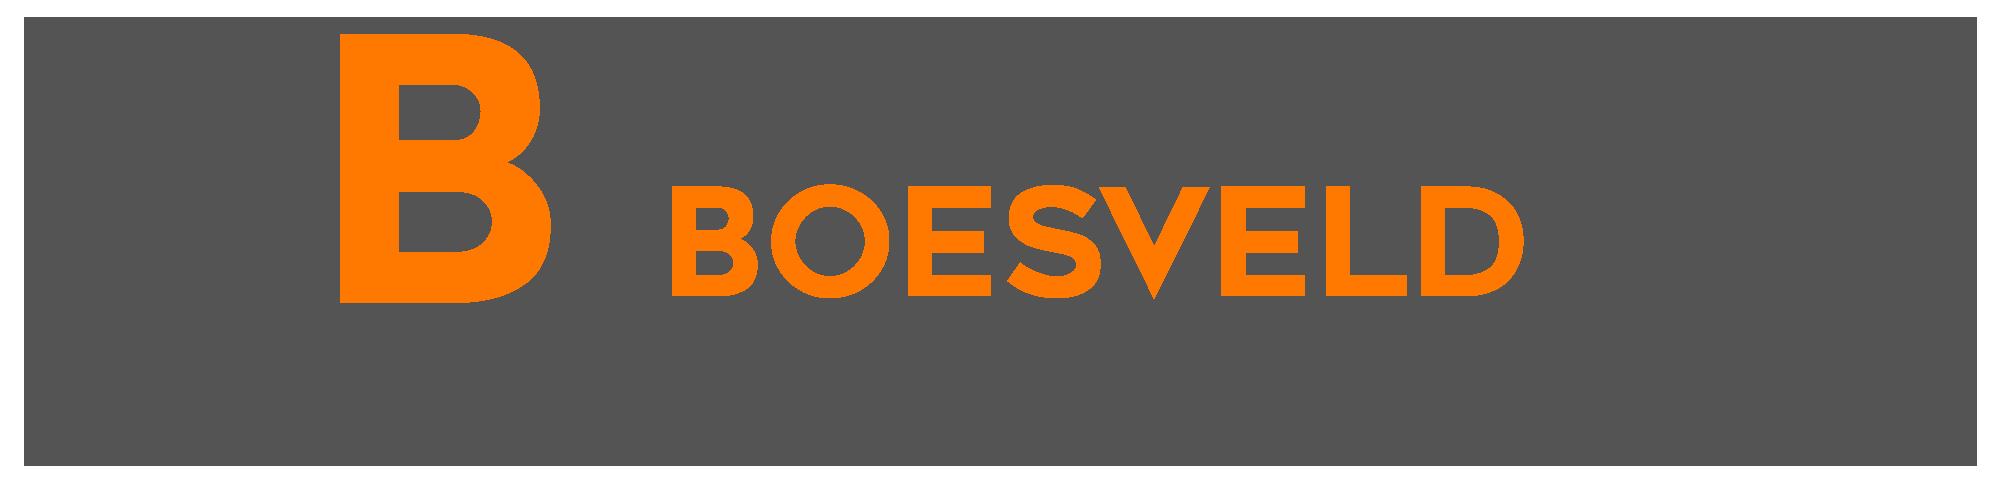 Boesveld Groep BV